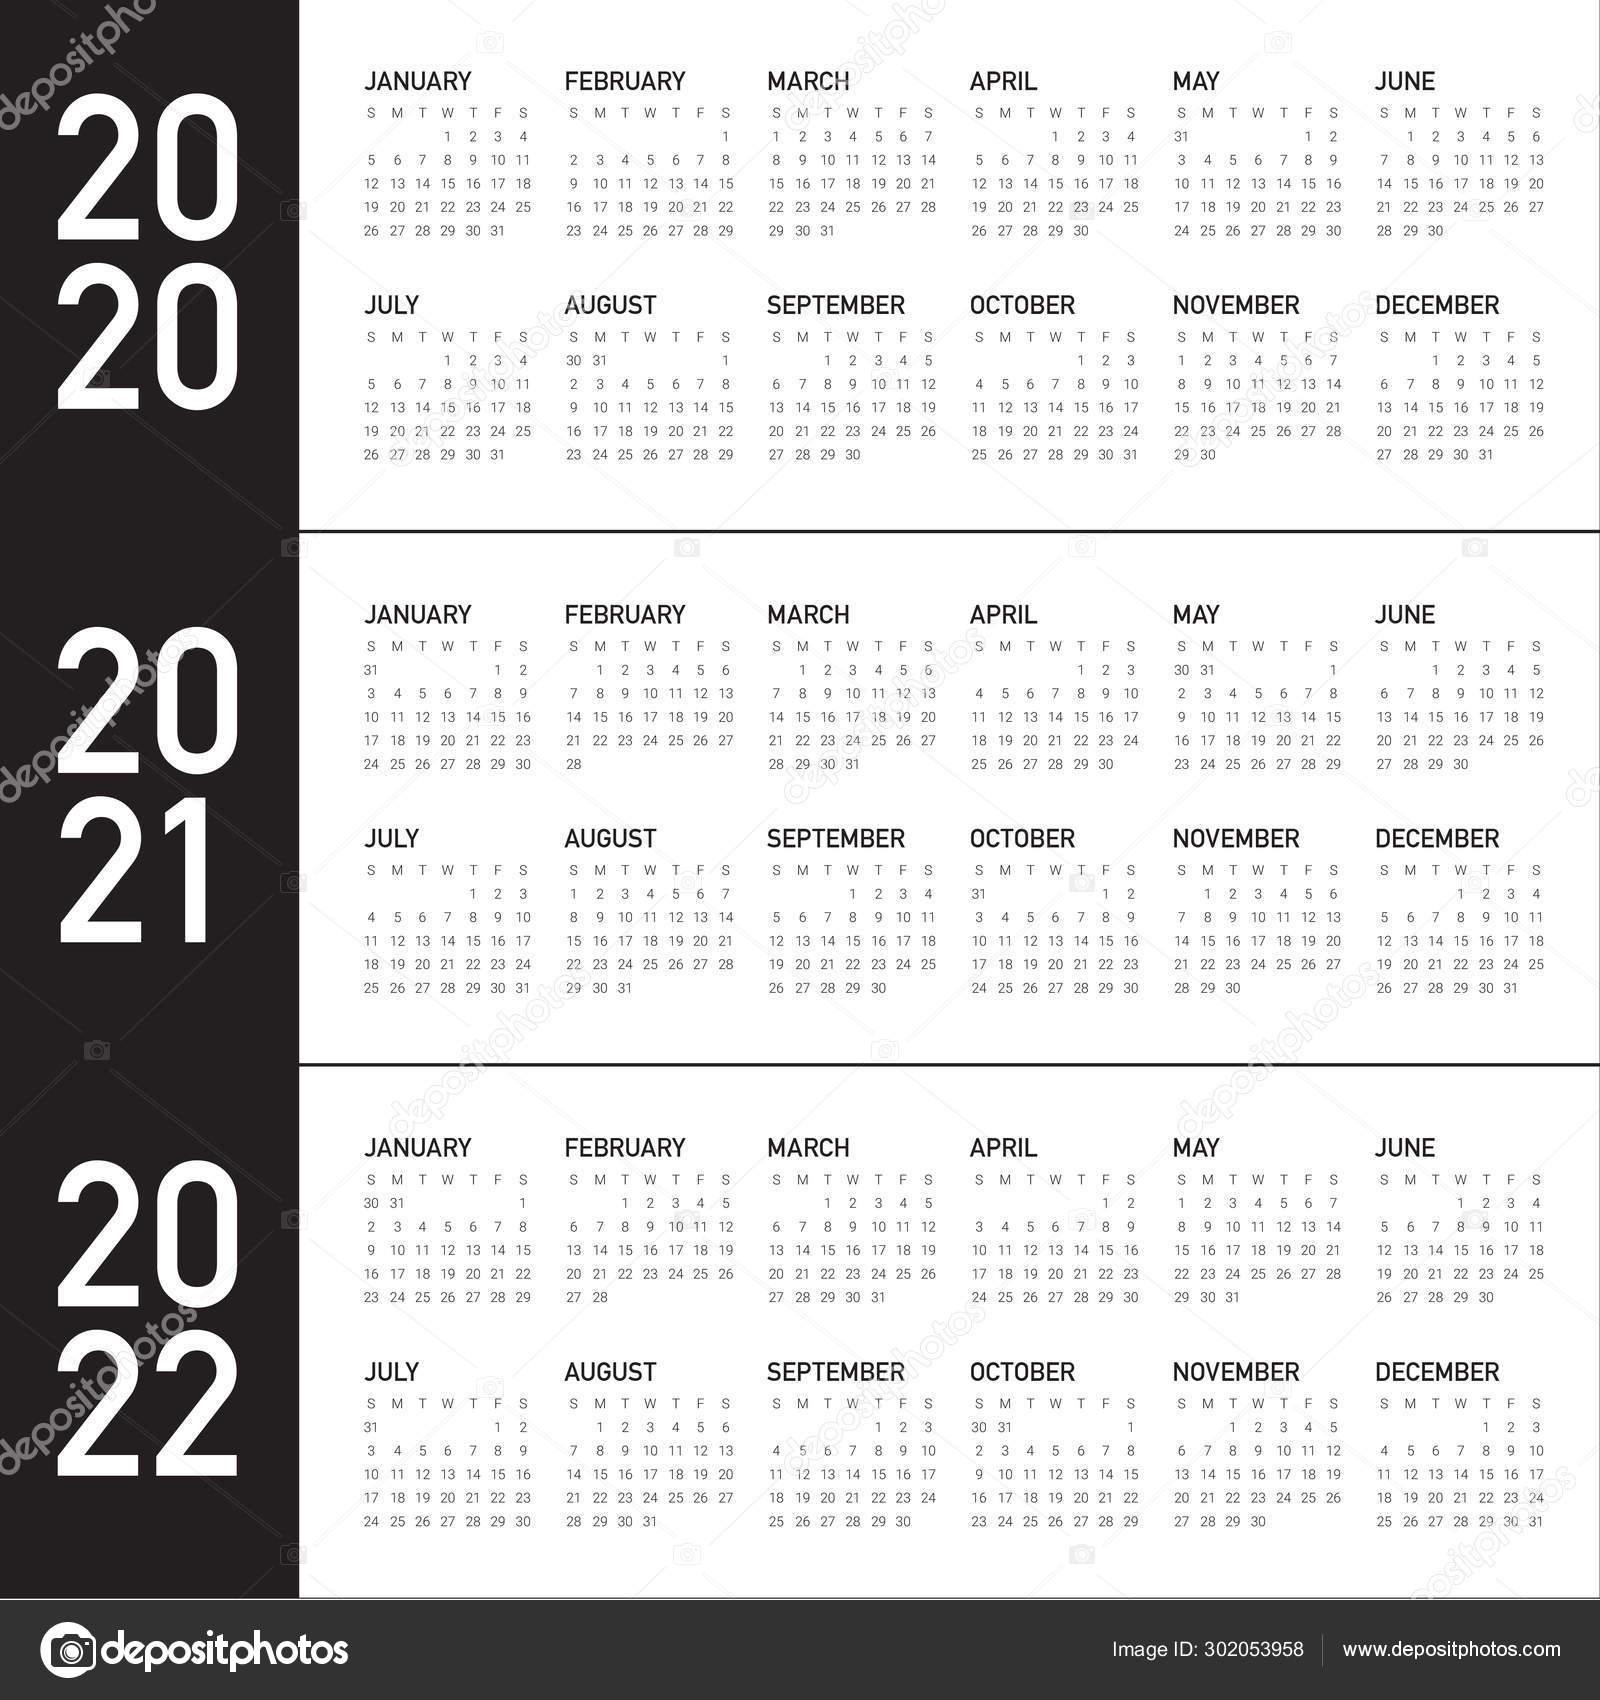 Depo Schedule Chart 2021